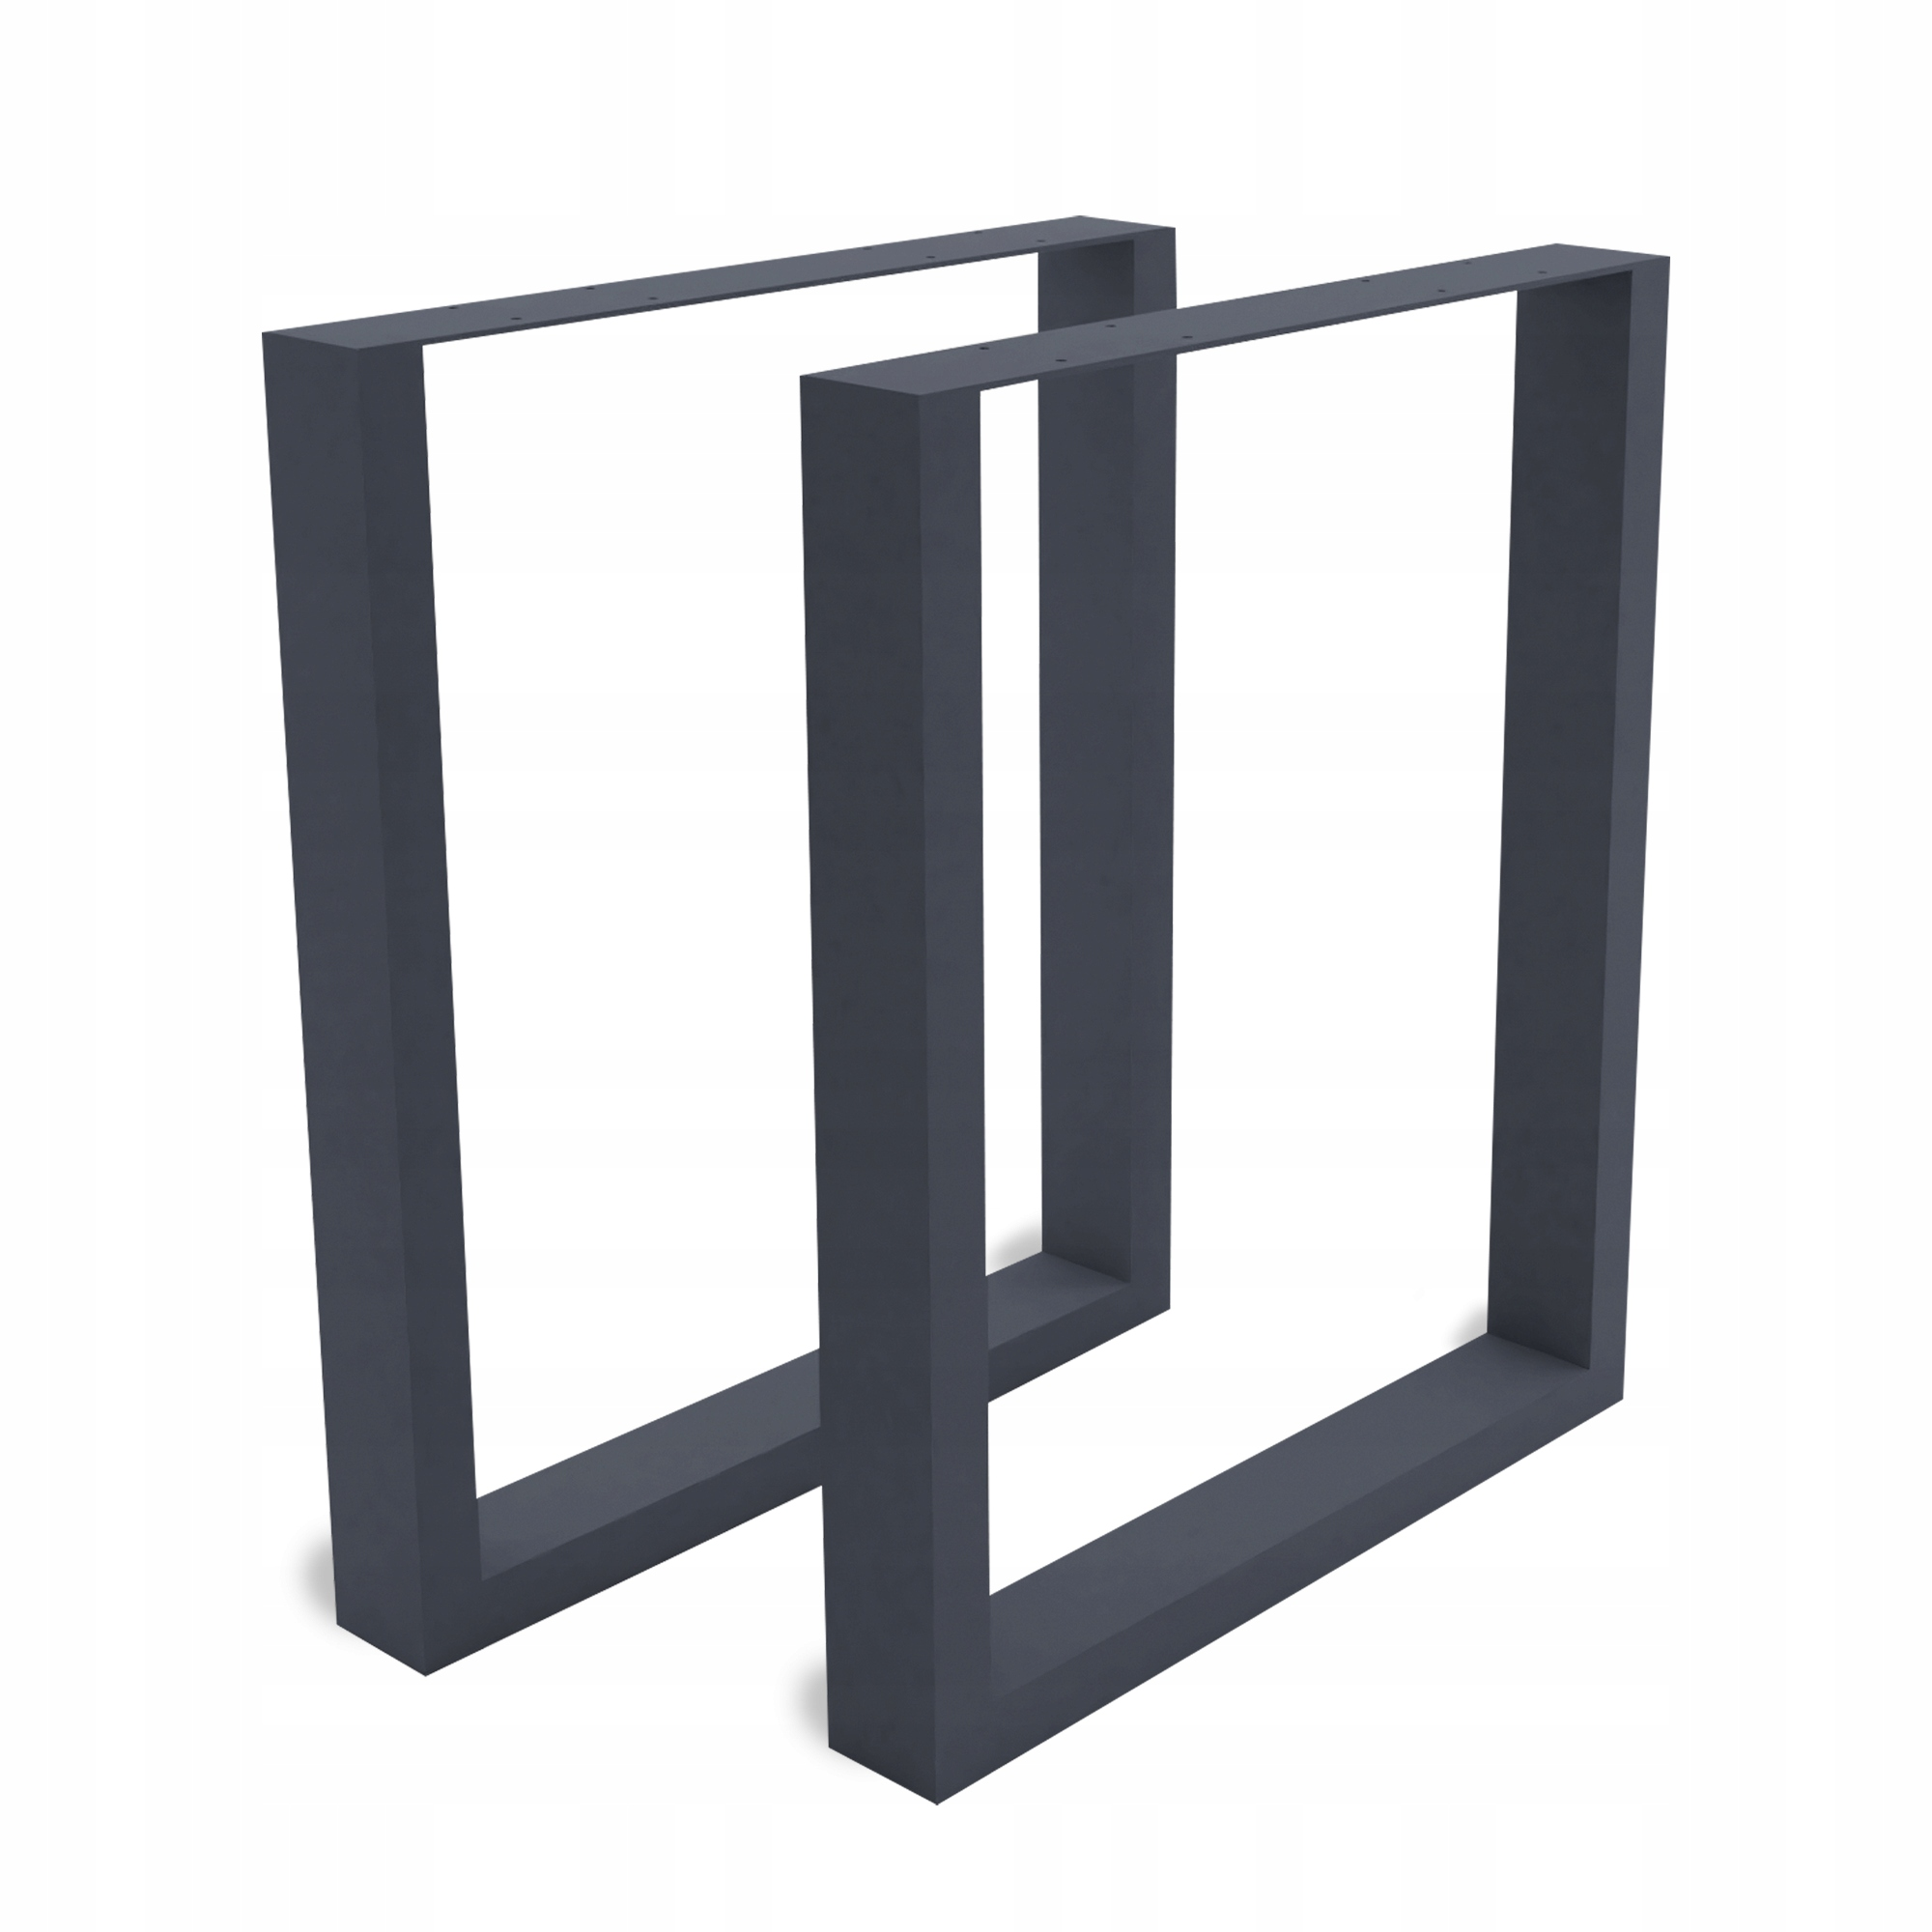 2x kovové stolové nohy 40x42 cm antracitové 6x2 cm